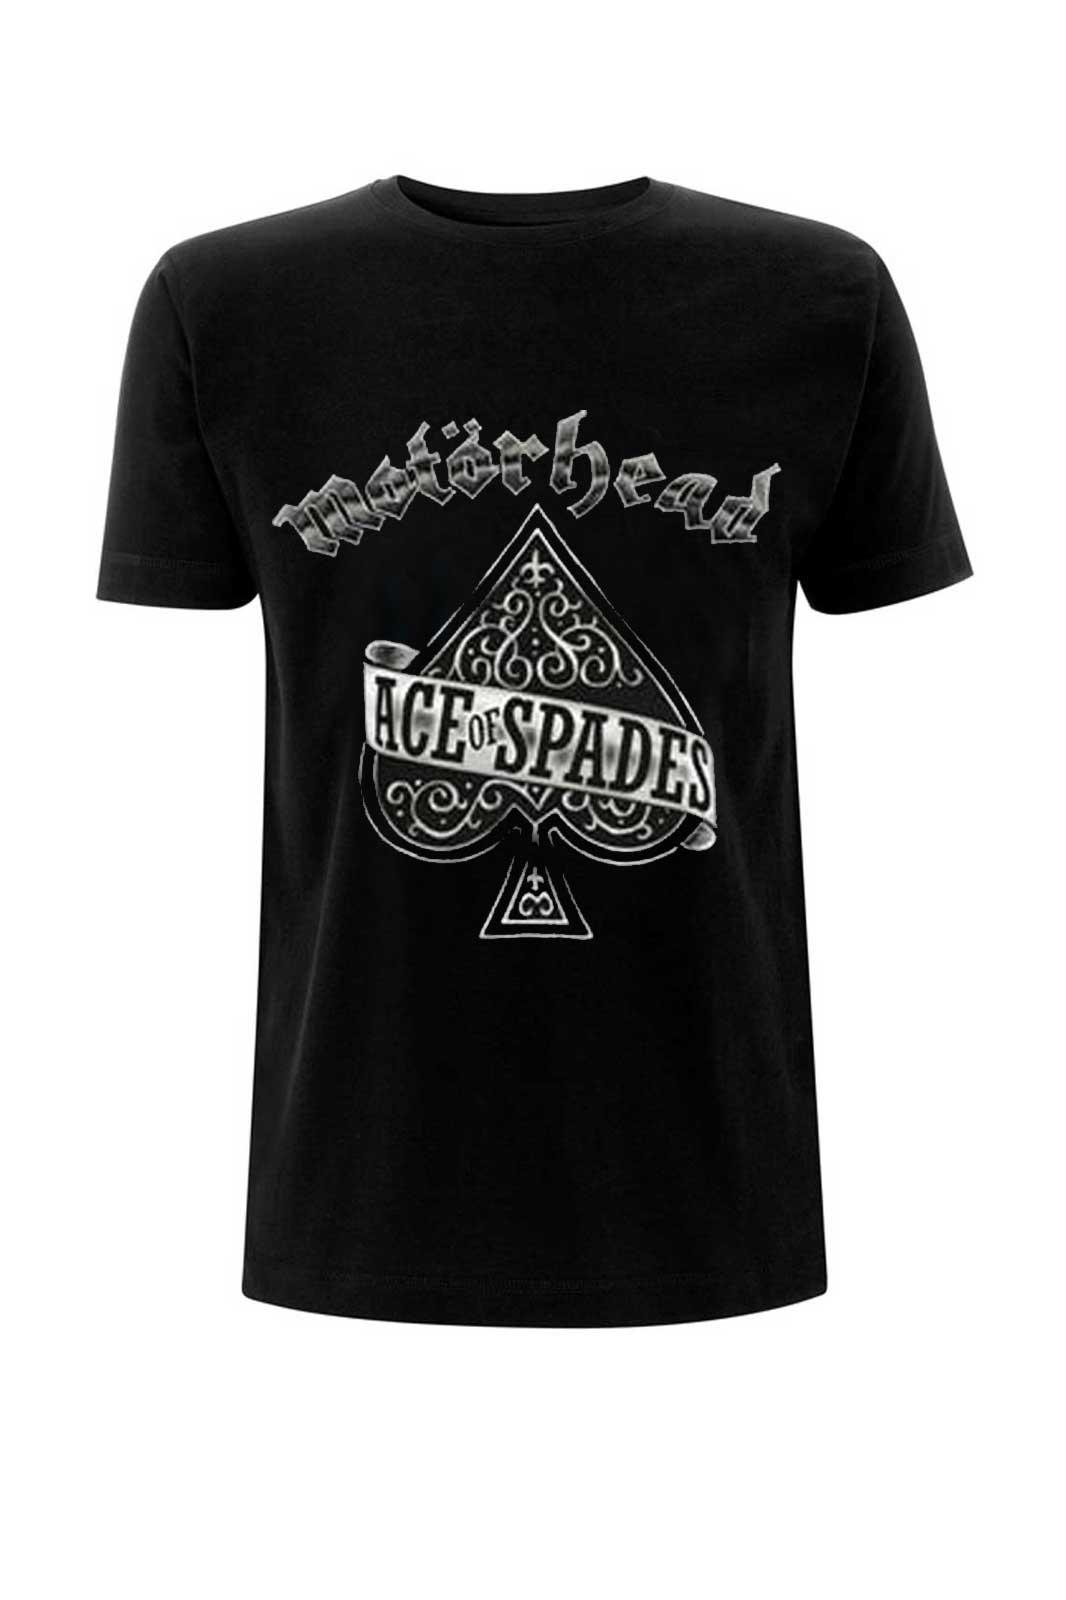 official merchandise motörhead ace of spades